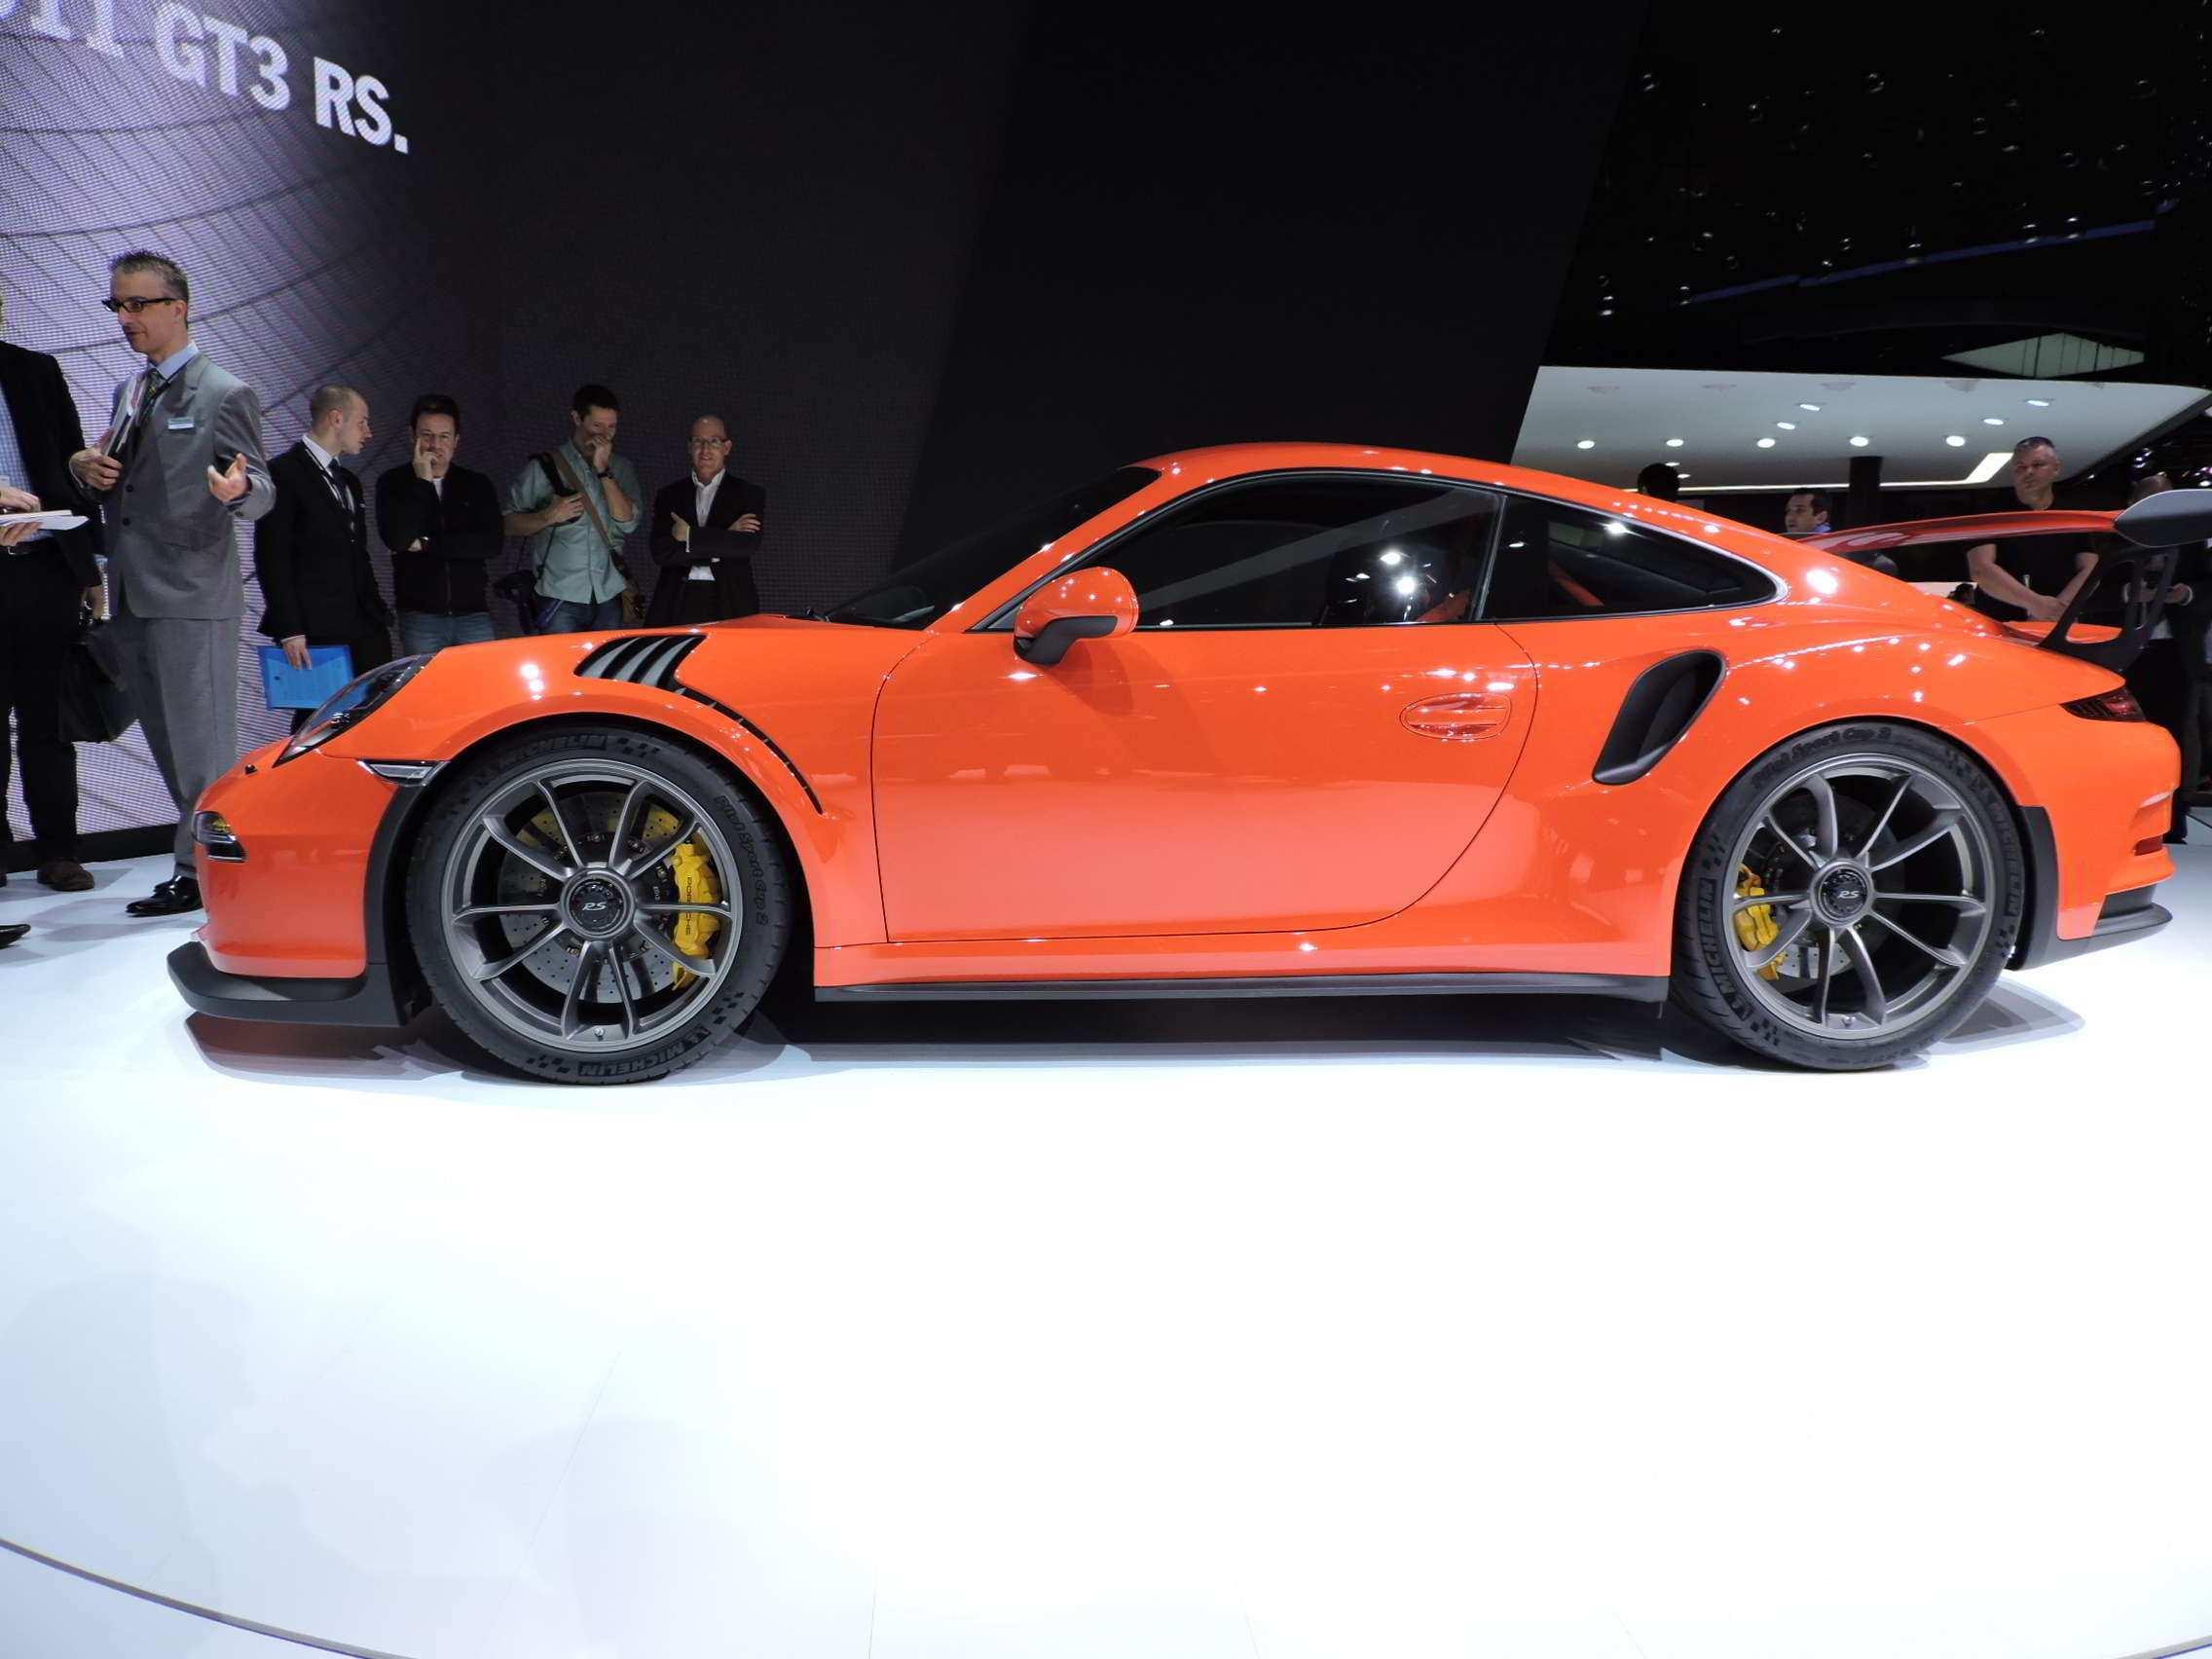 49 Concept of 2020 Porsche Gt3 Rs Exterior and Interior by 2020 Porsche Gt3 Rs